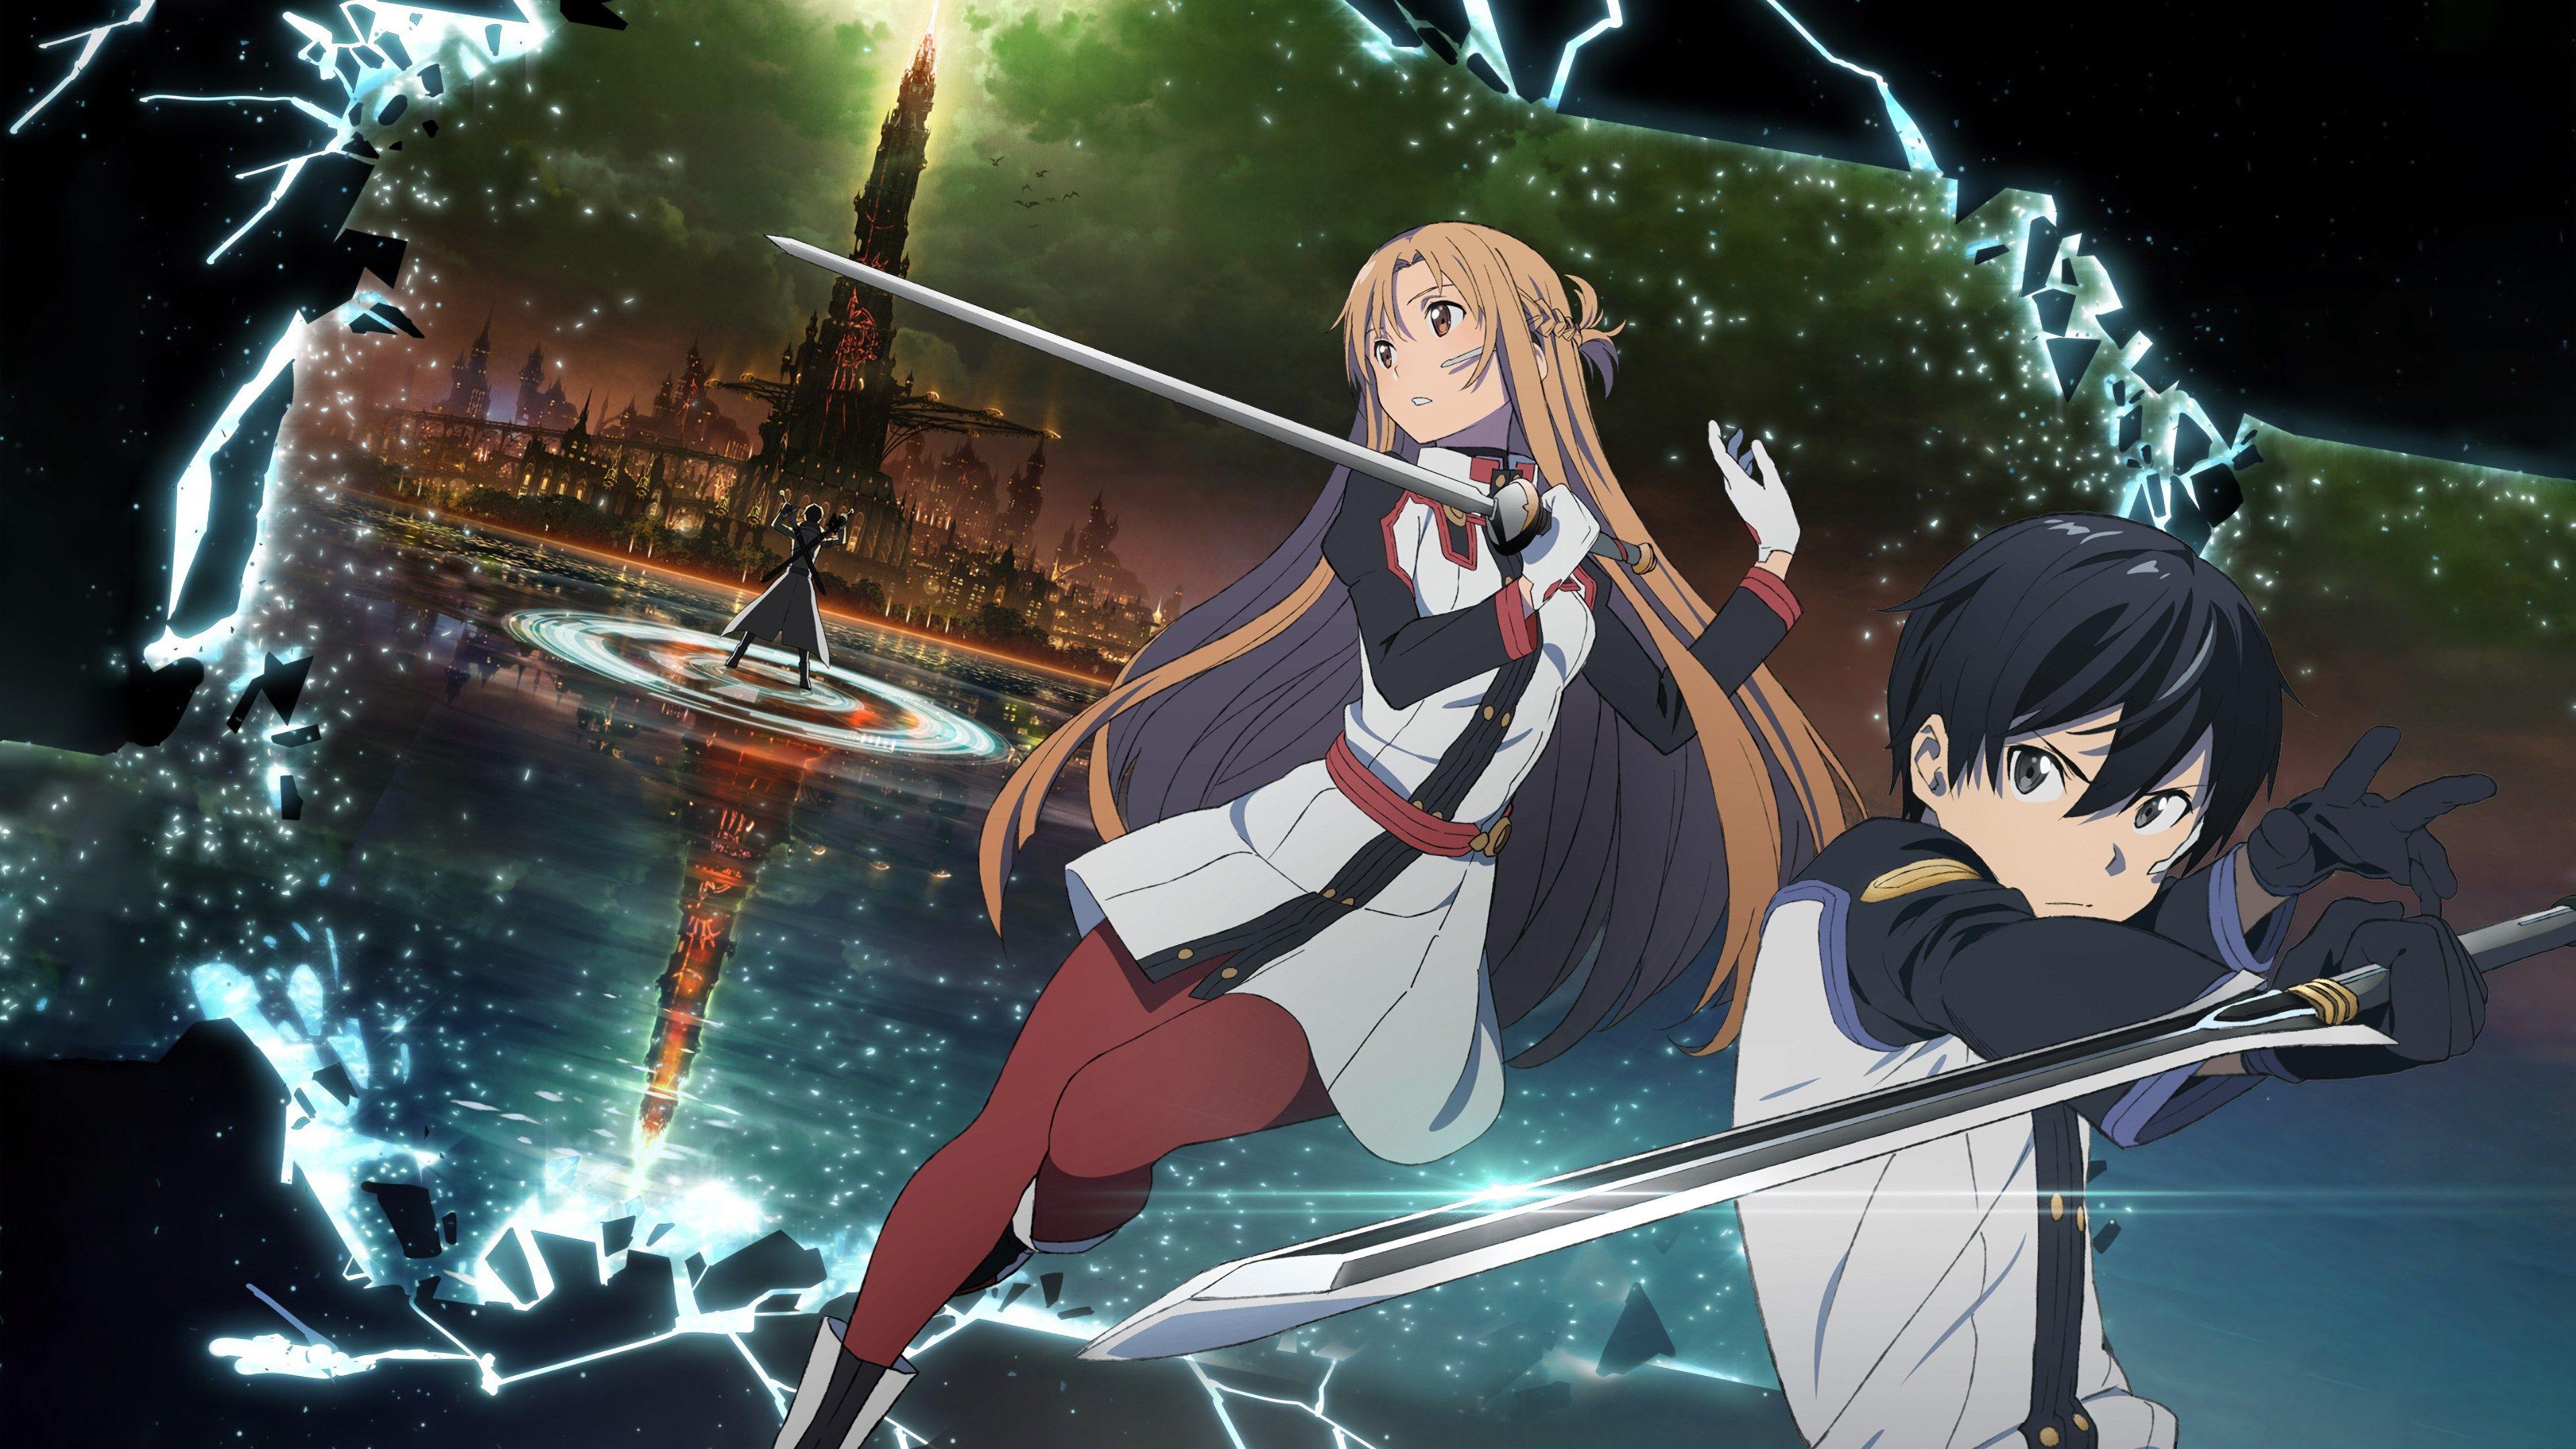 4k Wallpaper Sword Art Online Movie Ordinal Scale 3840x2160